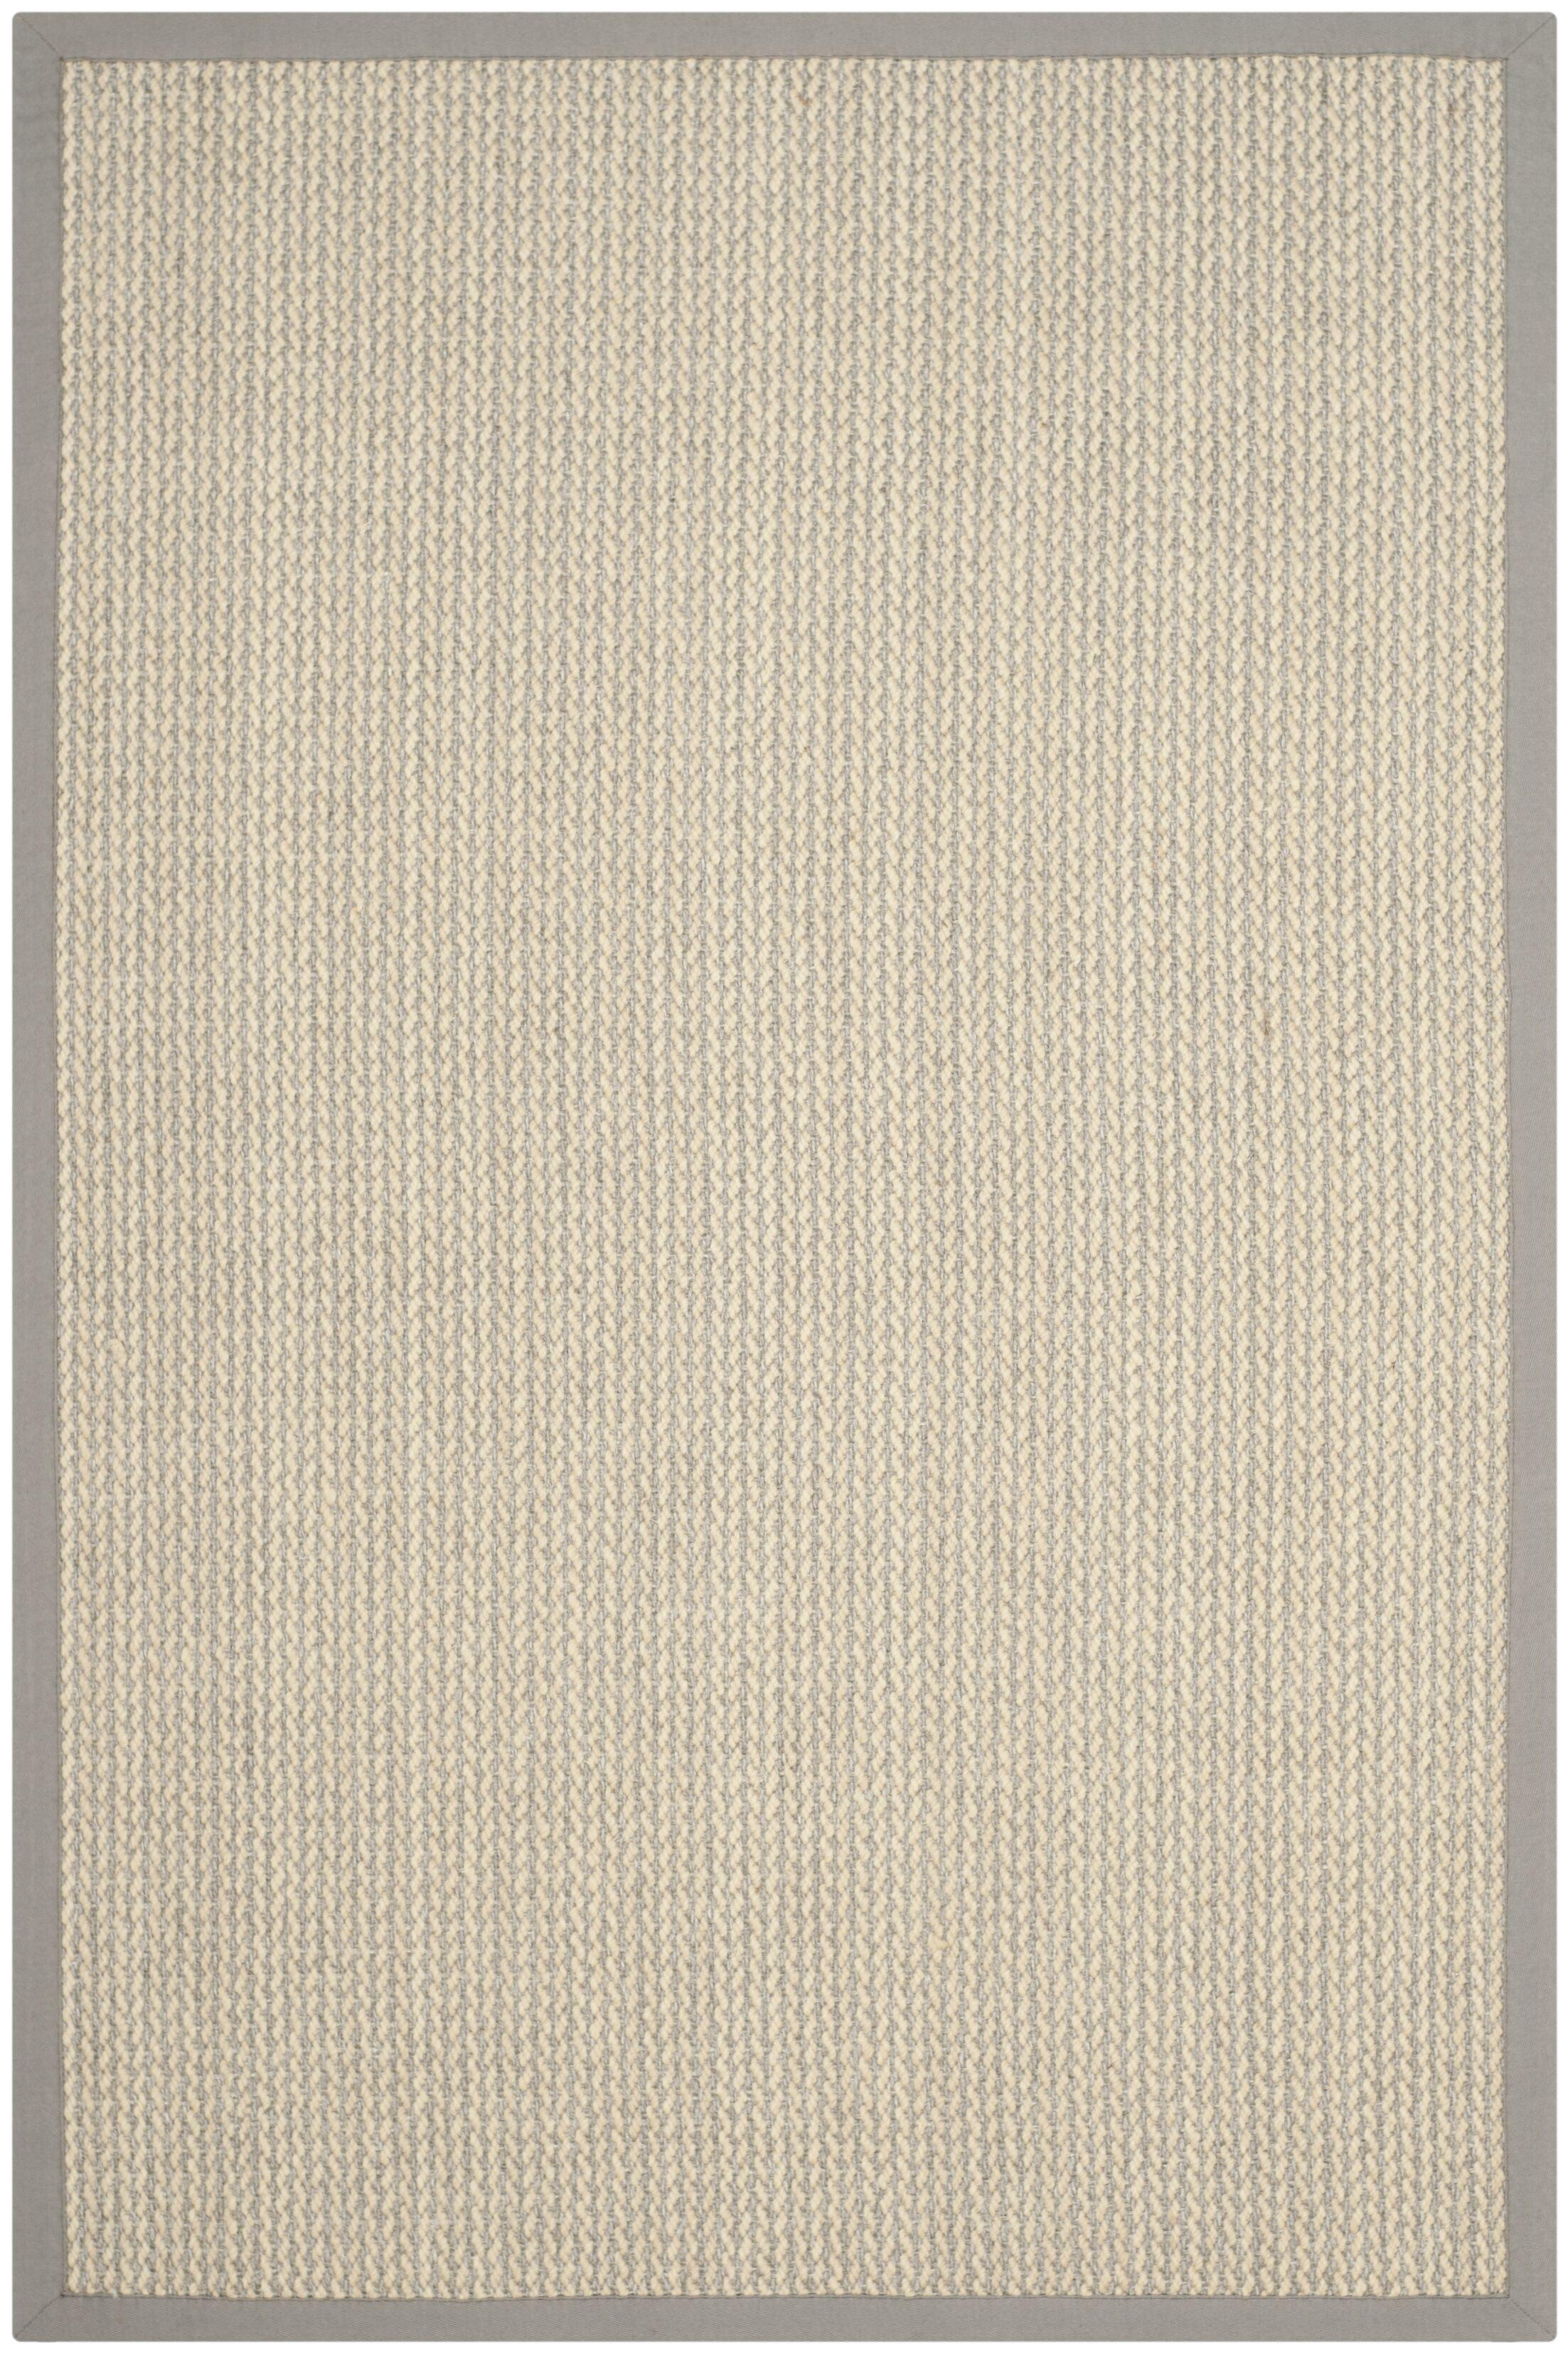 Hand-Woven Gray Area Rug Rug Size: Rectangle 10' x 14'